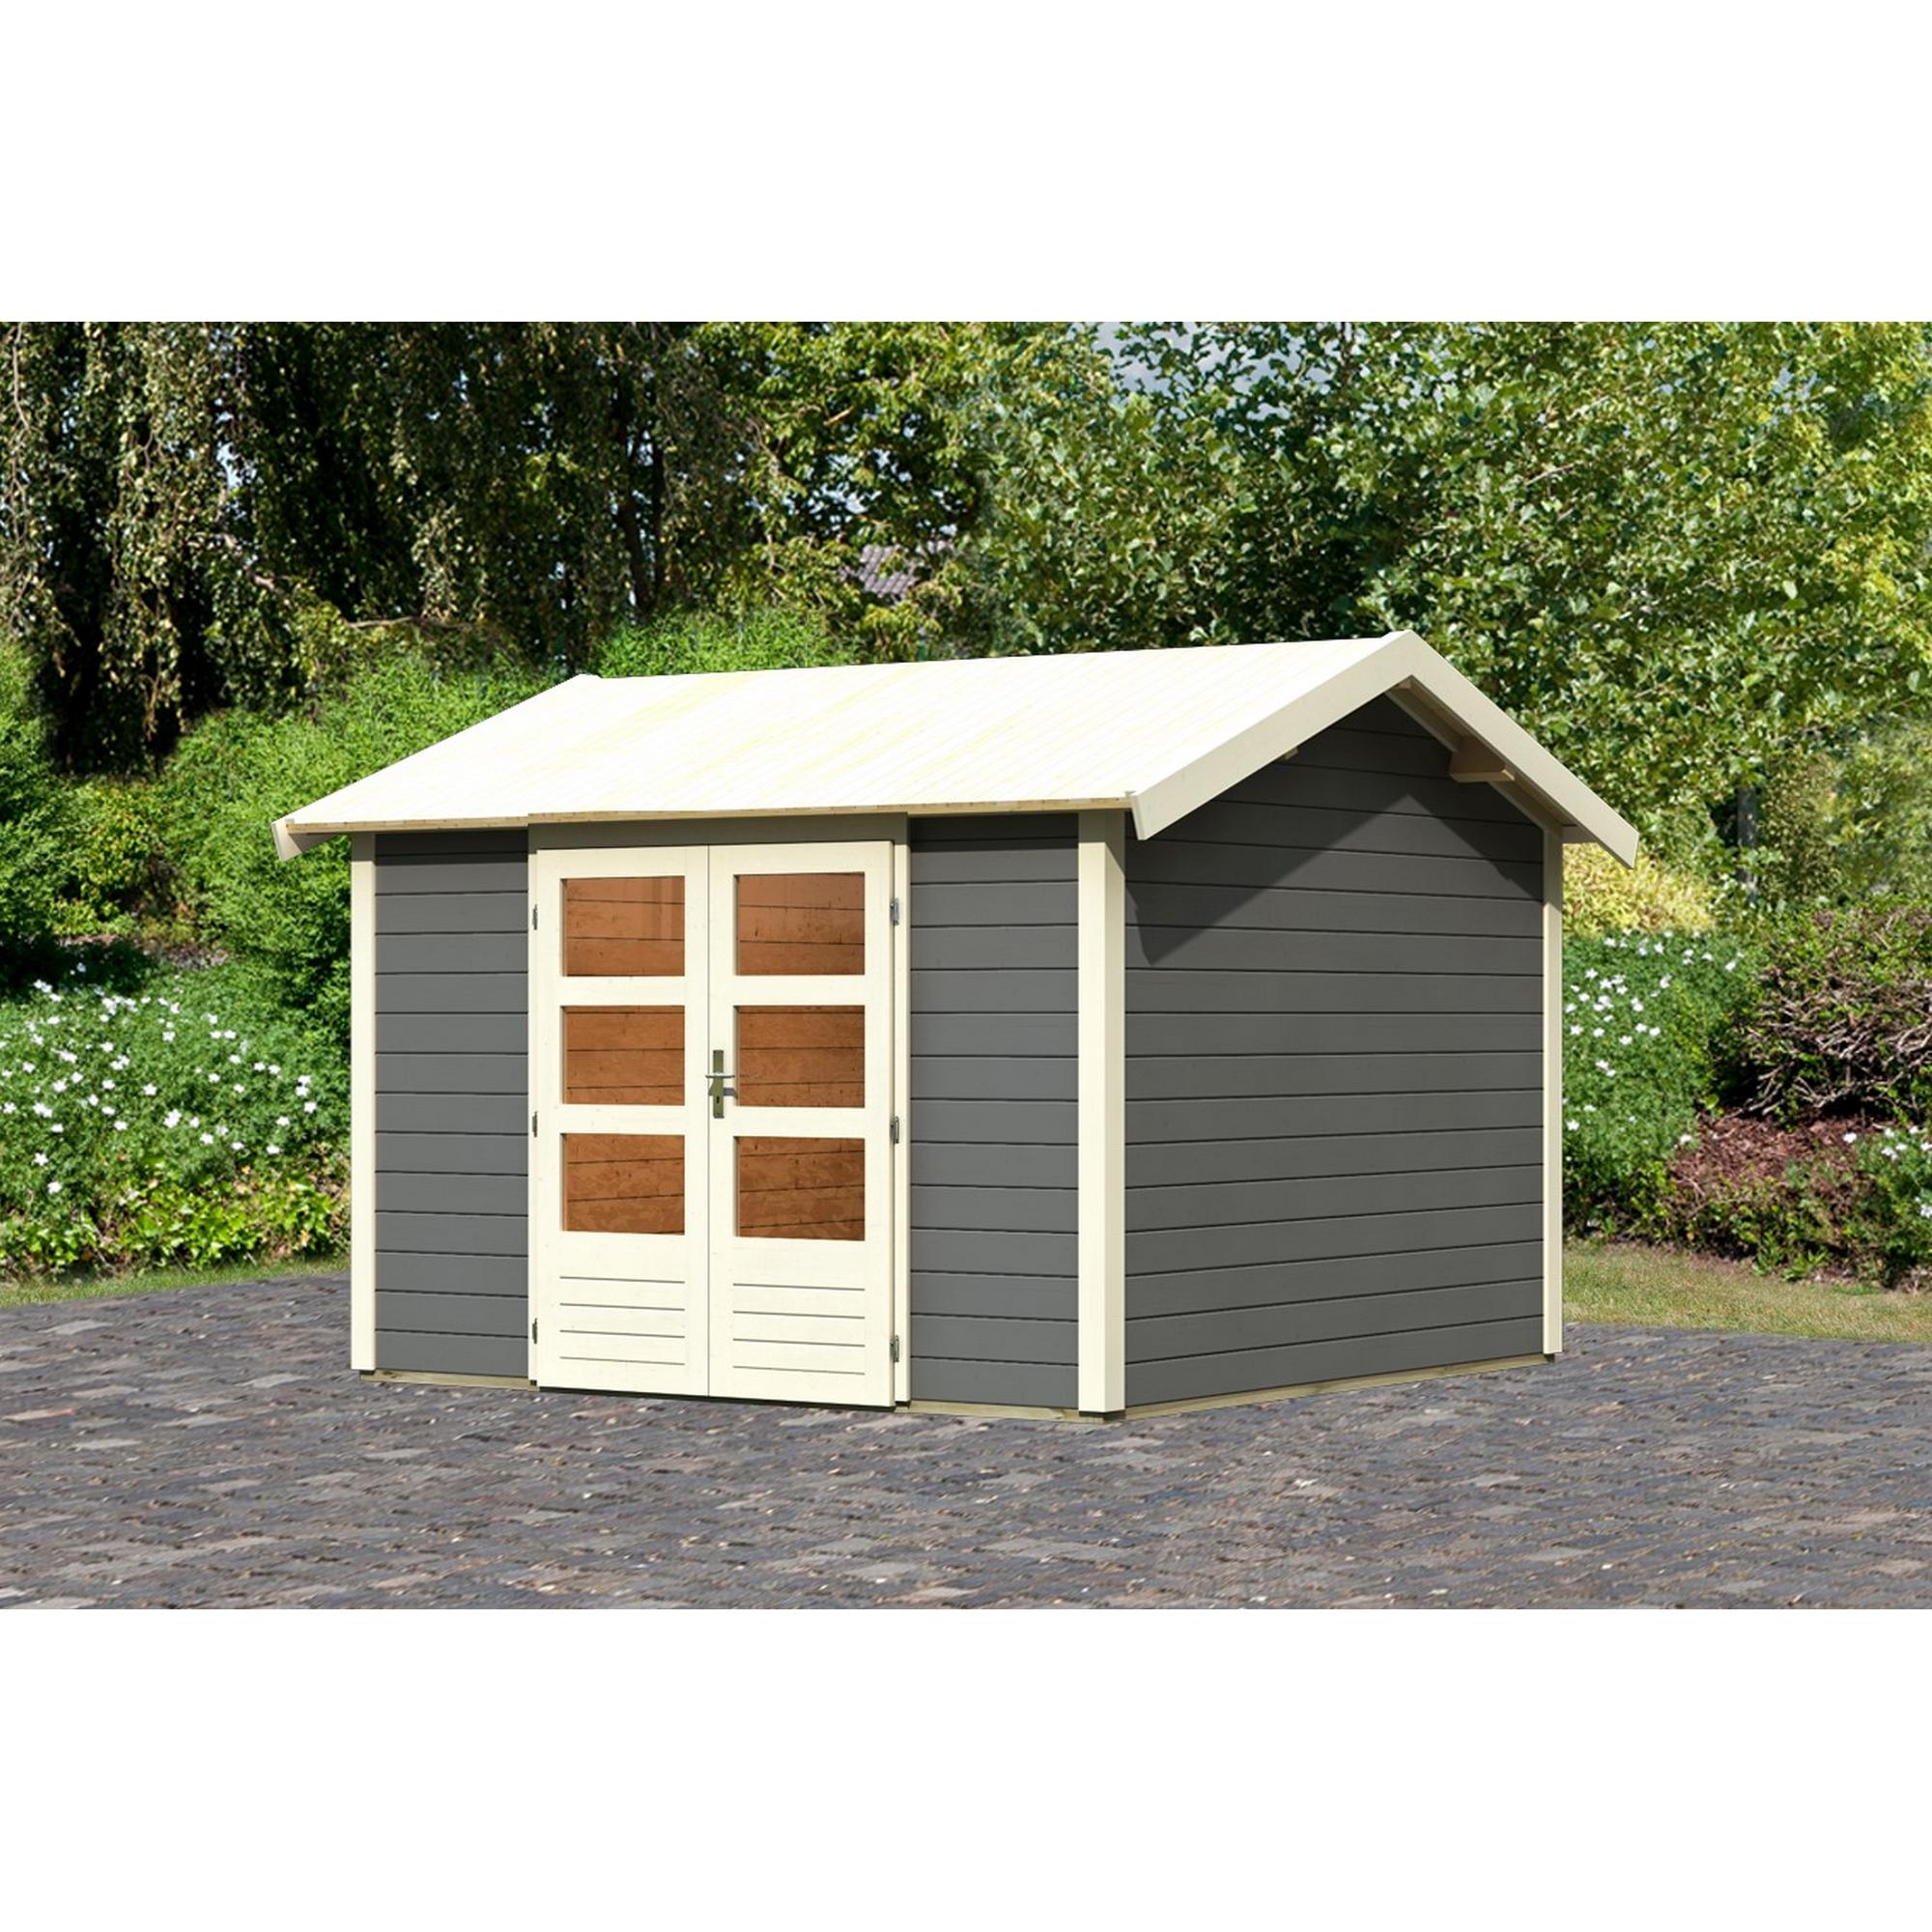 *Karibu Gartenhaus 'Mylau 7' 244 x 244 x 222 cm (BxTxH) terragrau*